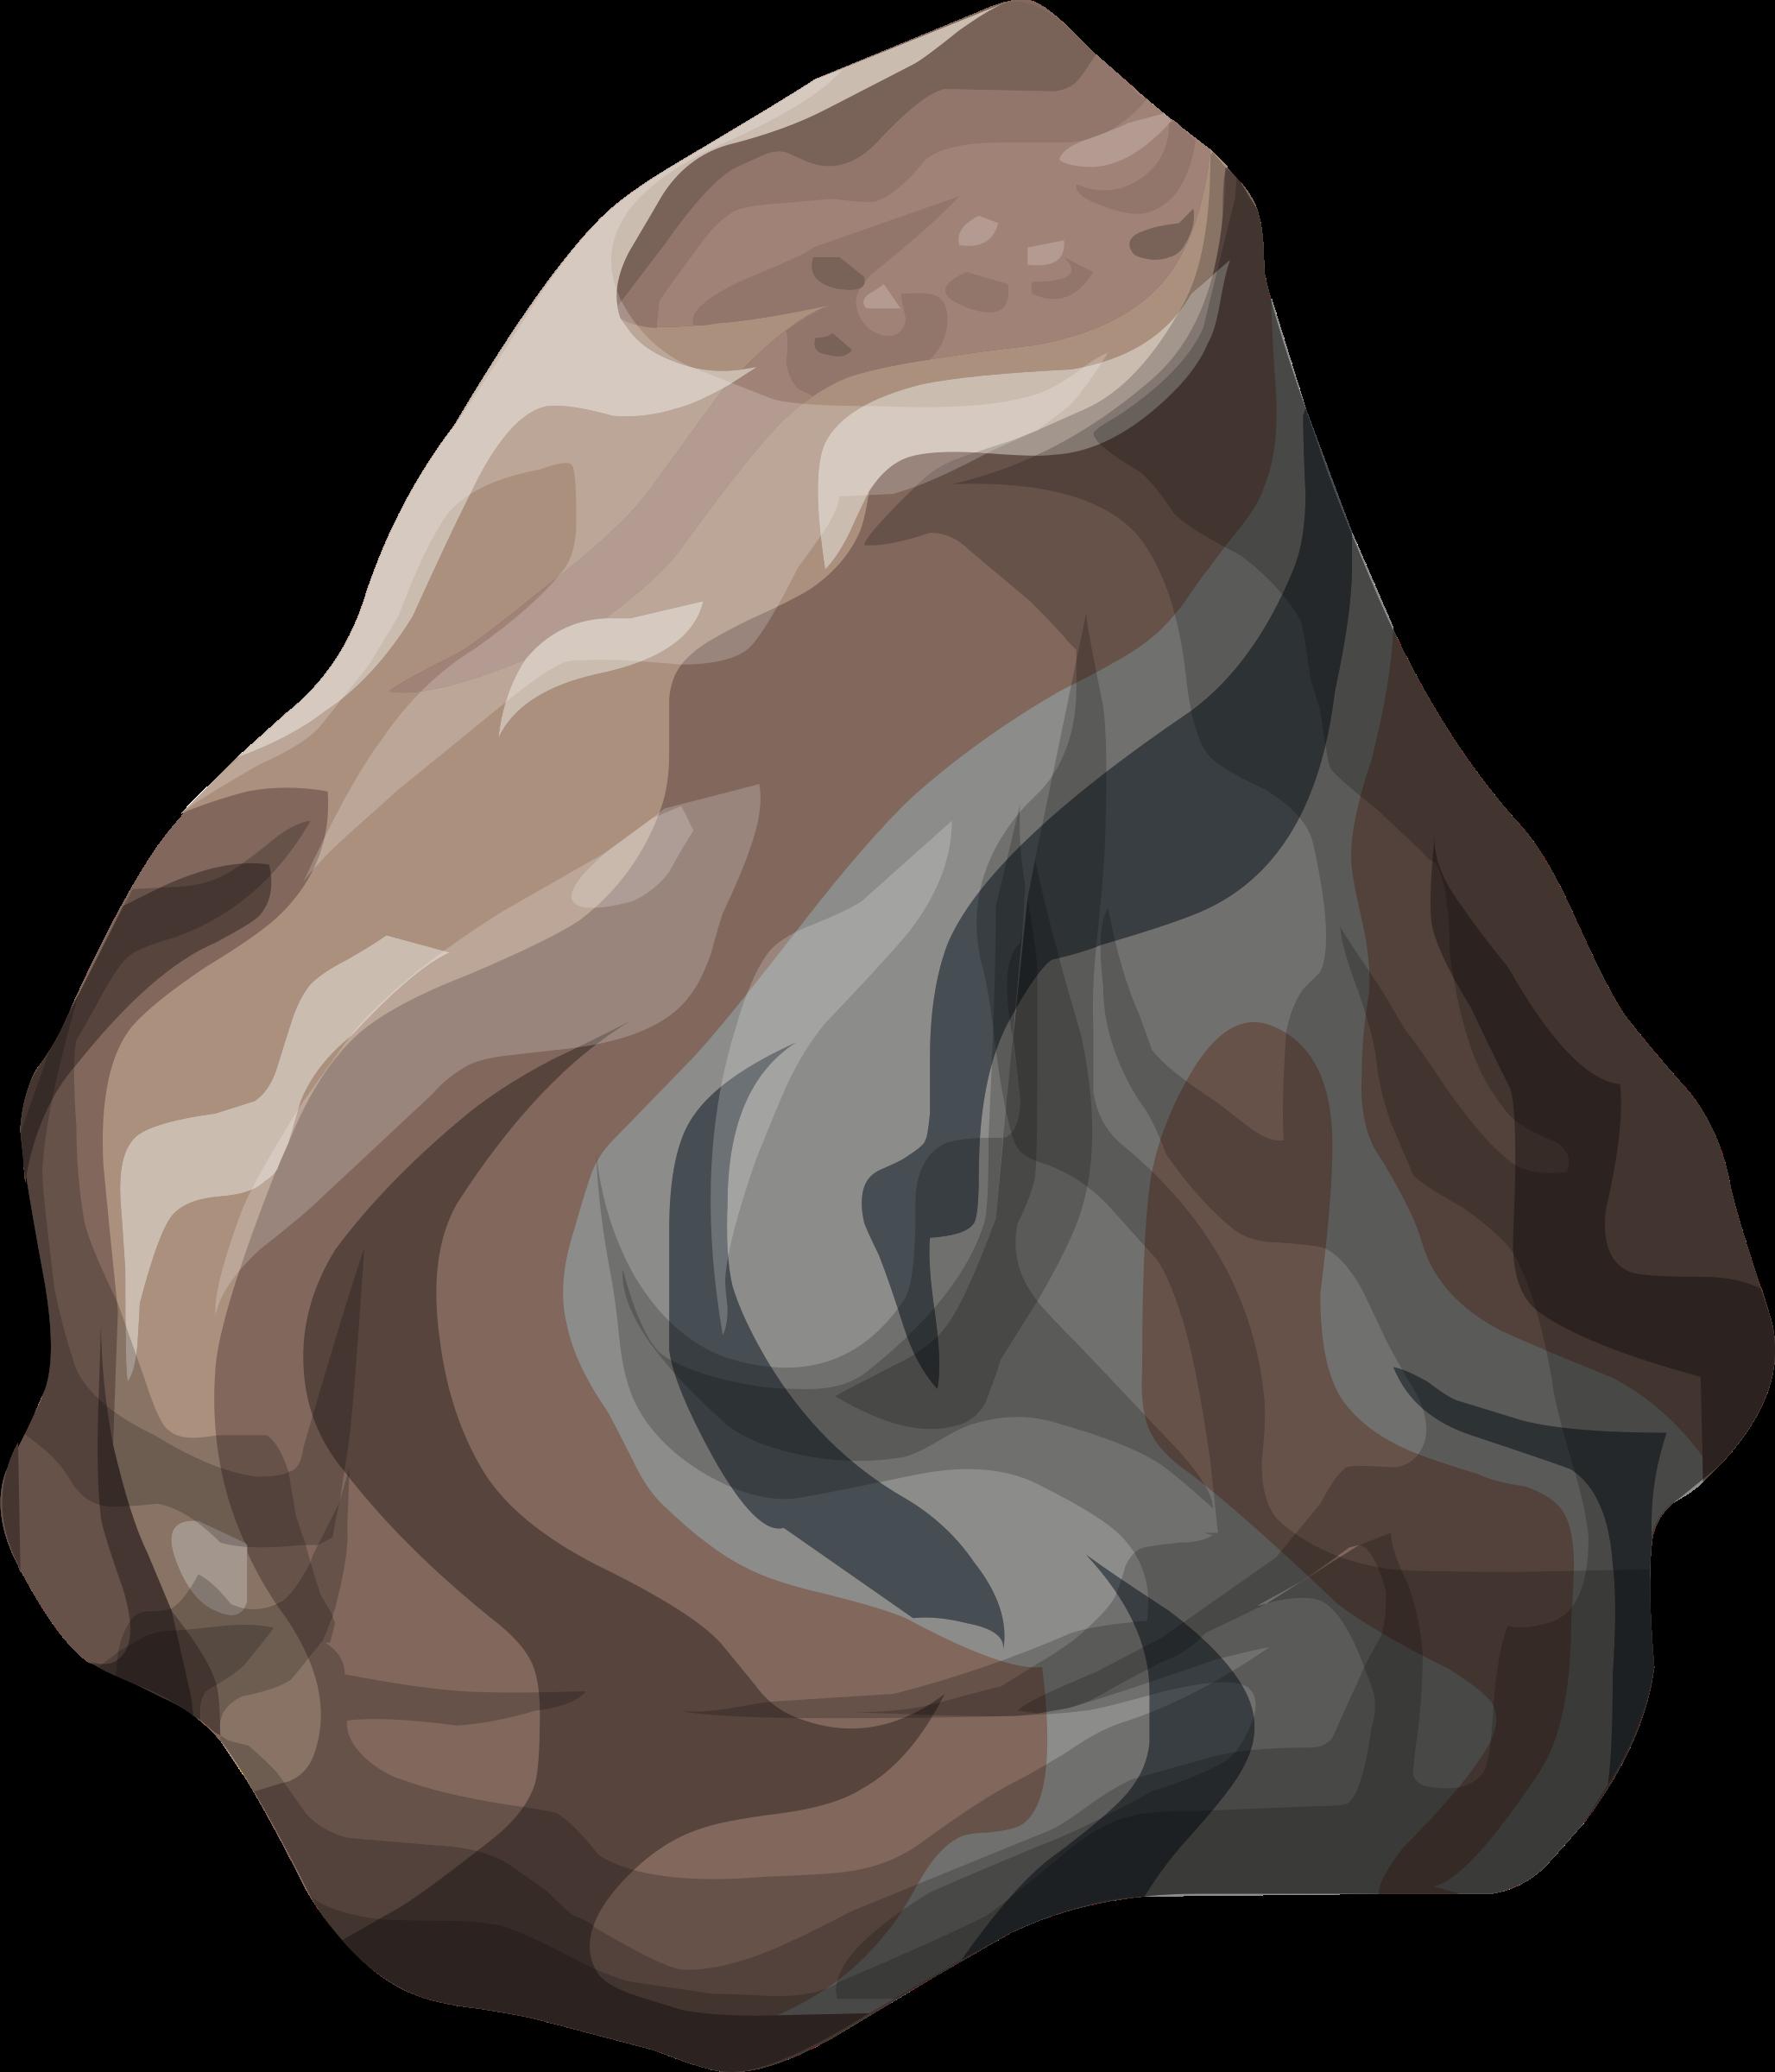 Rock clipart png